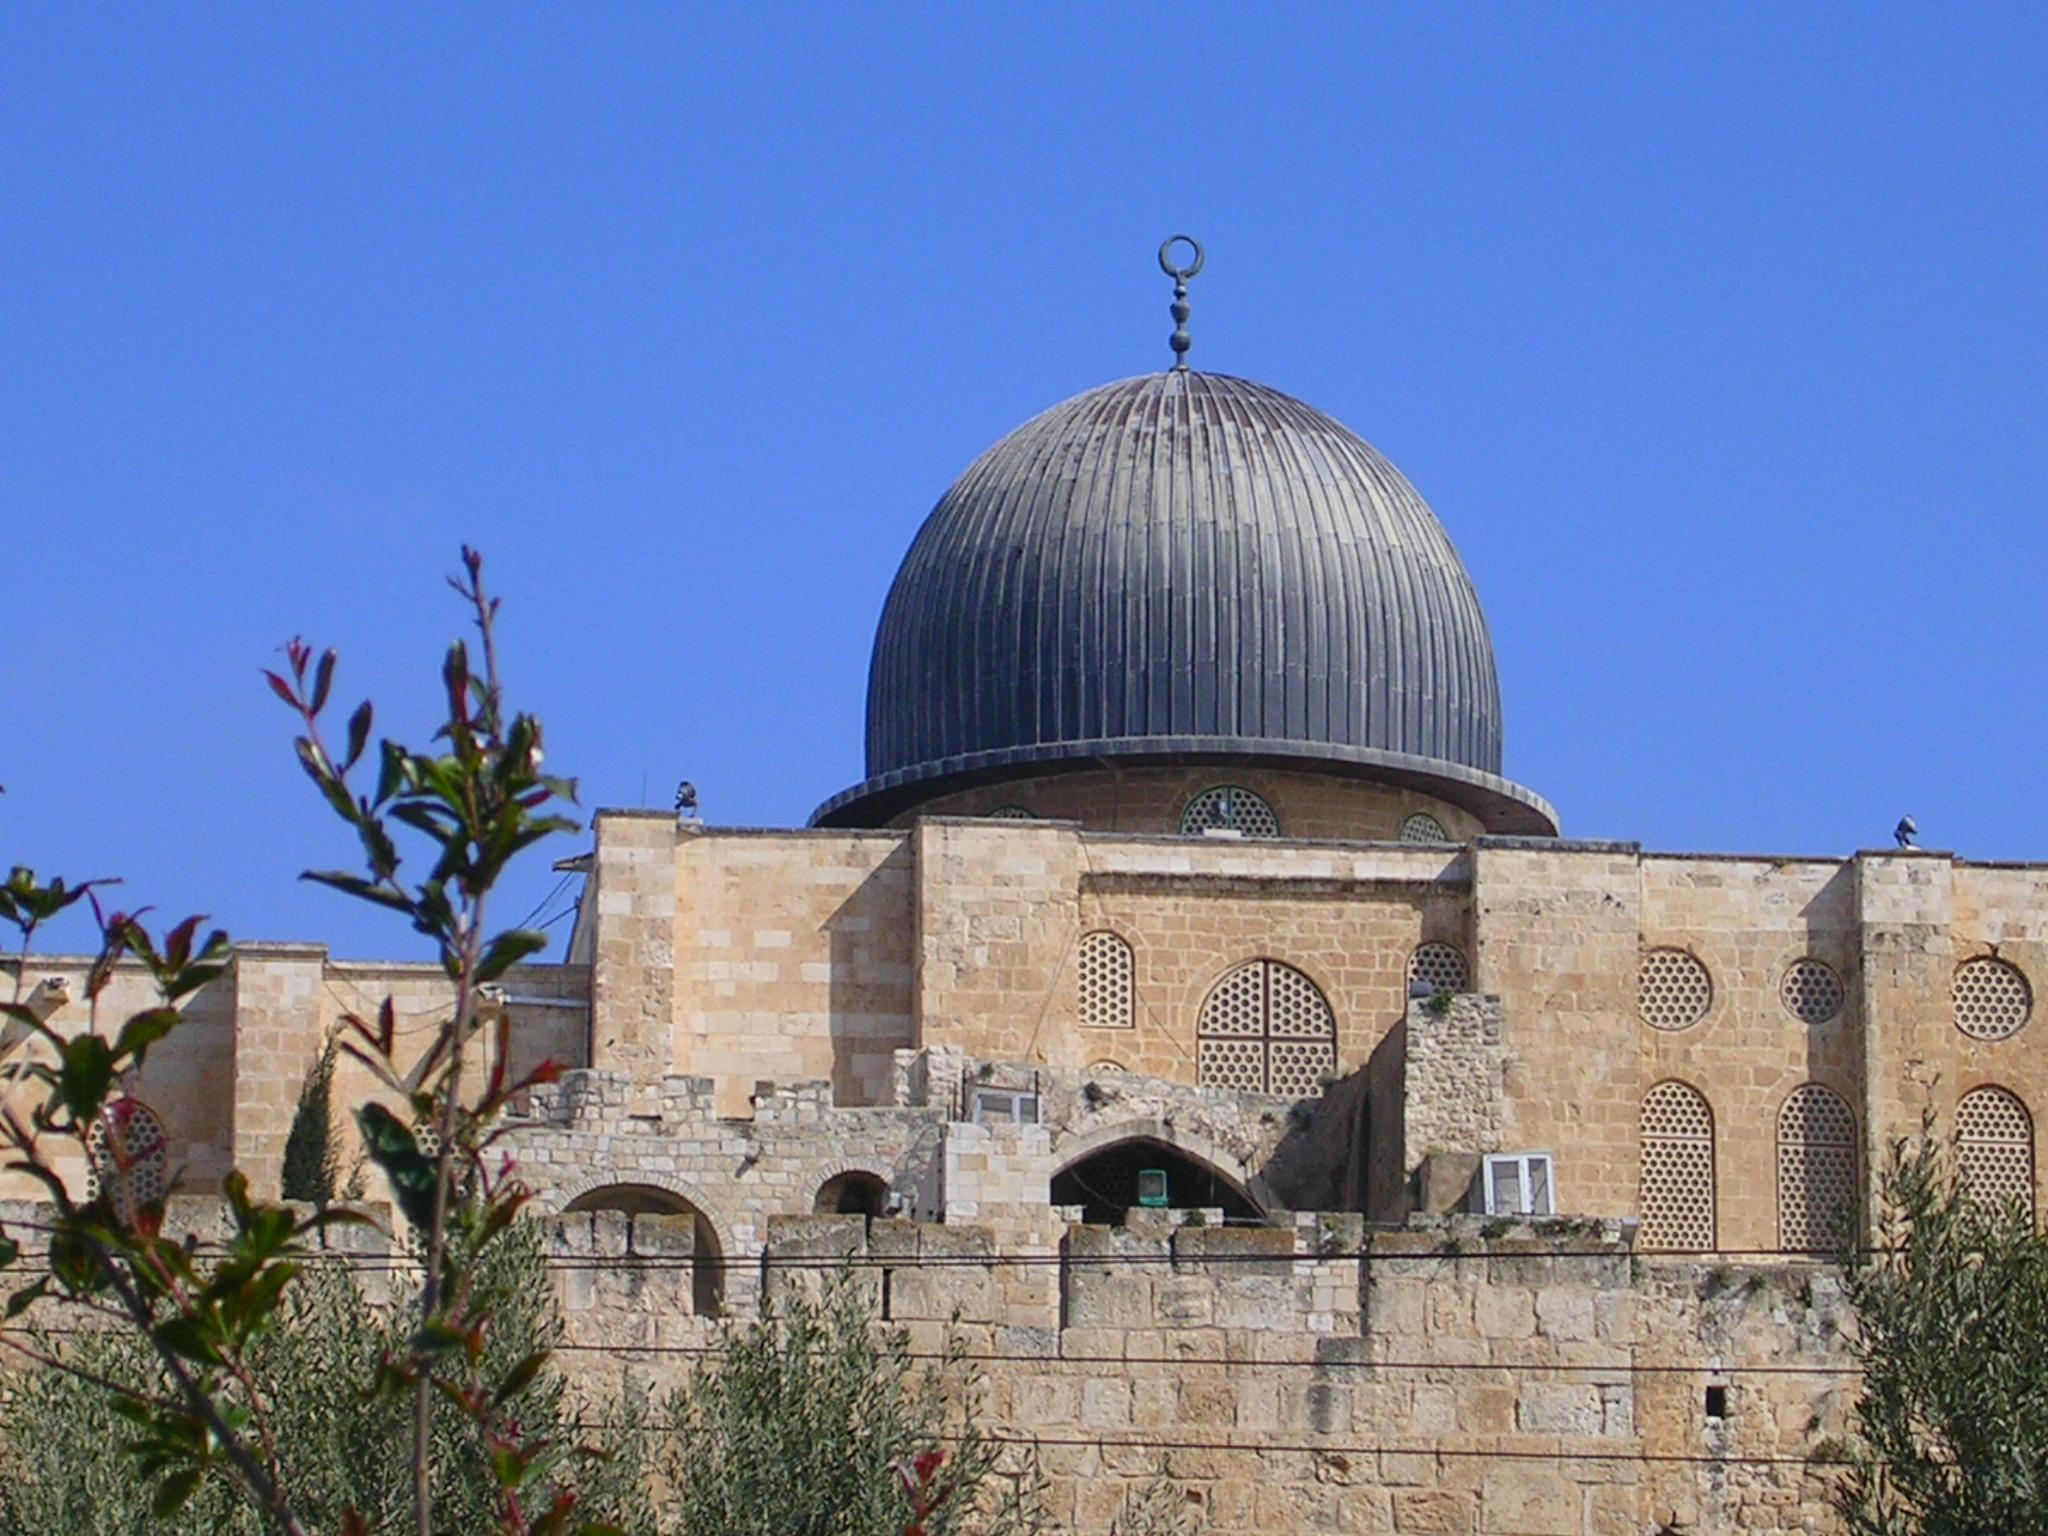 Dome of the Al-Aqsa Mosque in Jerusalem